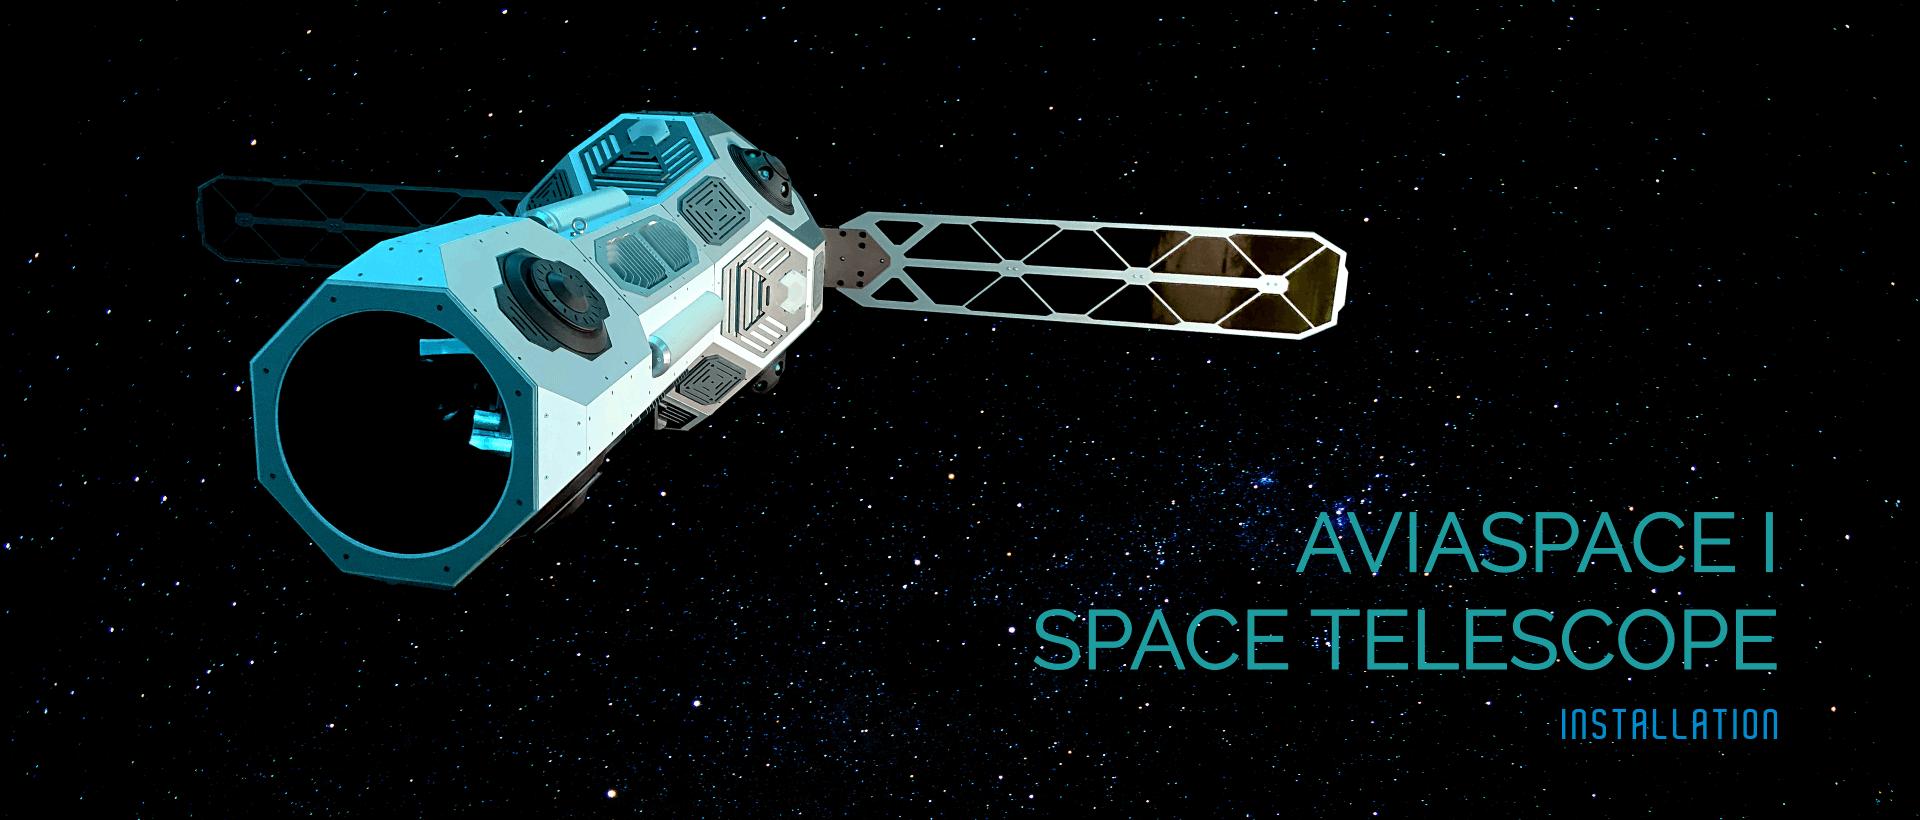 Aviaspace I